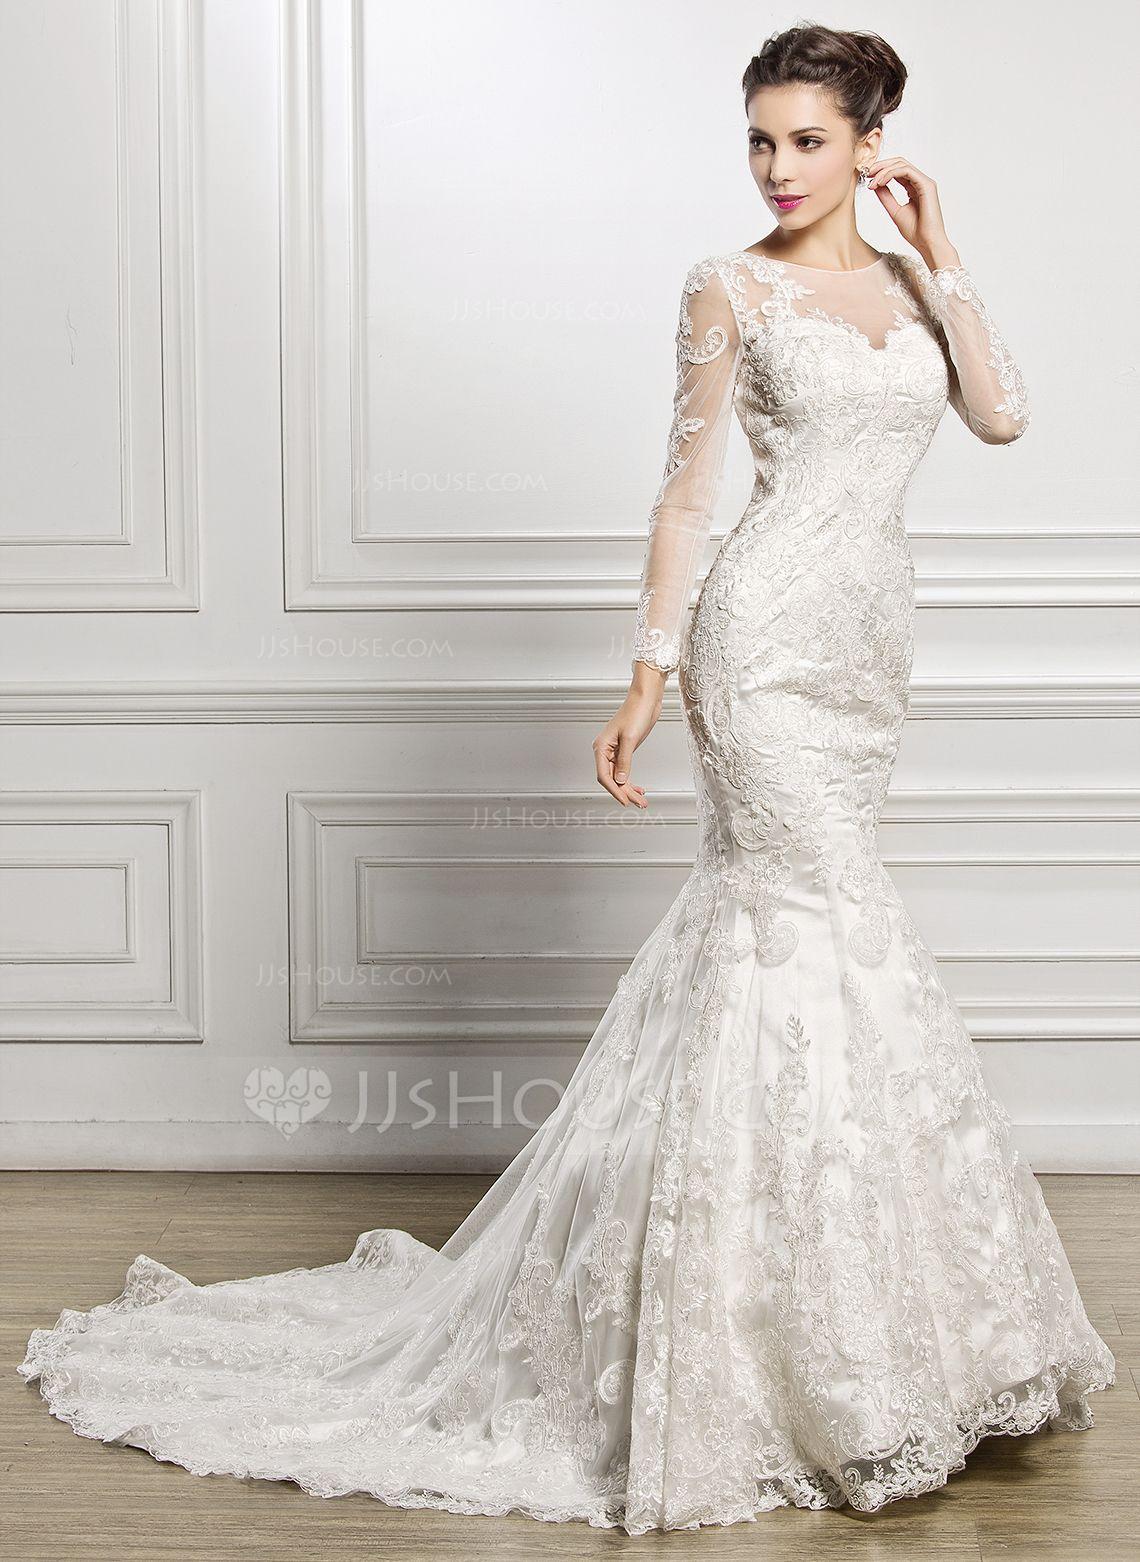 Trumpetmermaid scoop neck chapel train tulle lace wedding dress